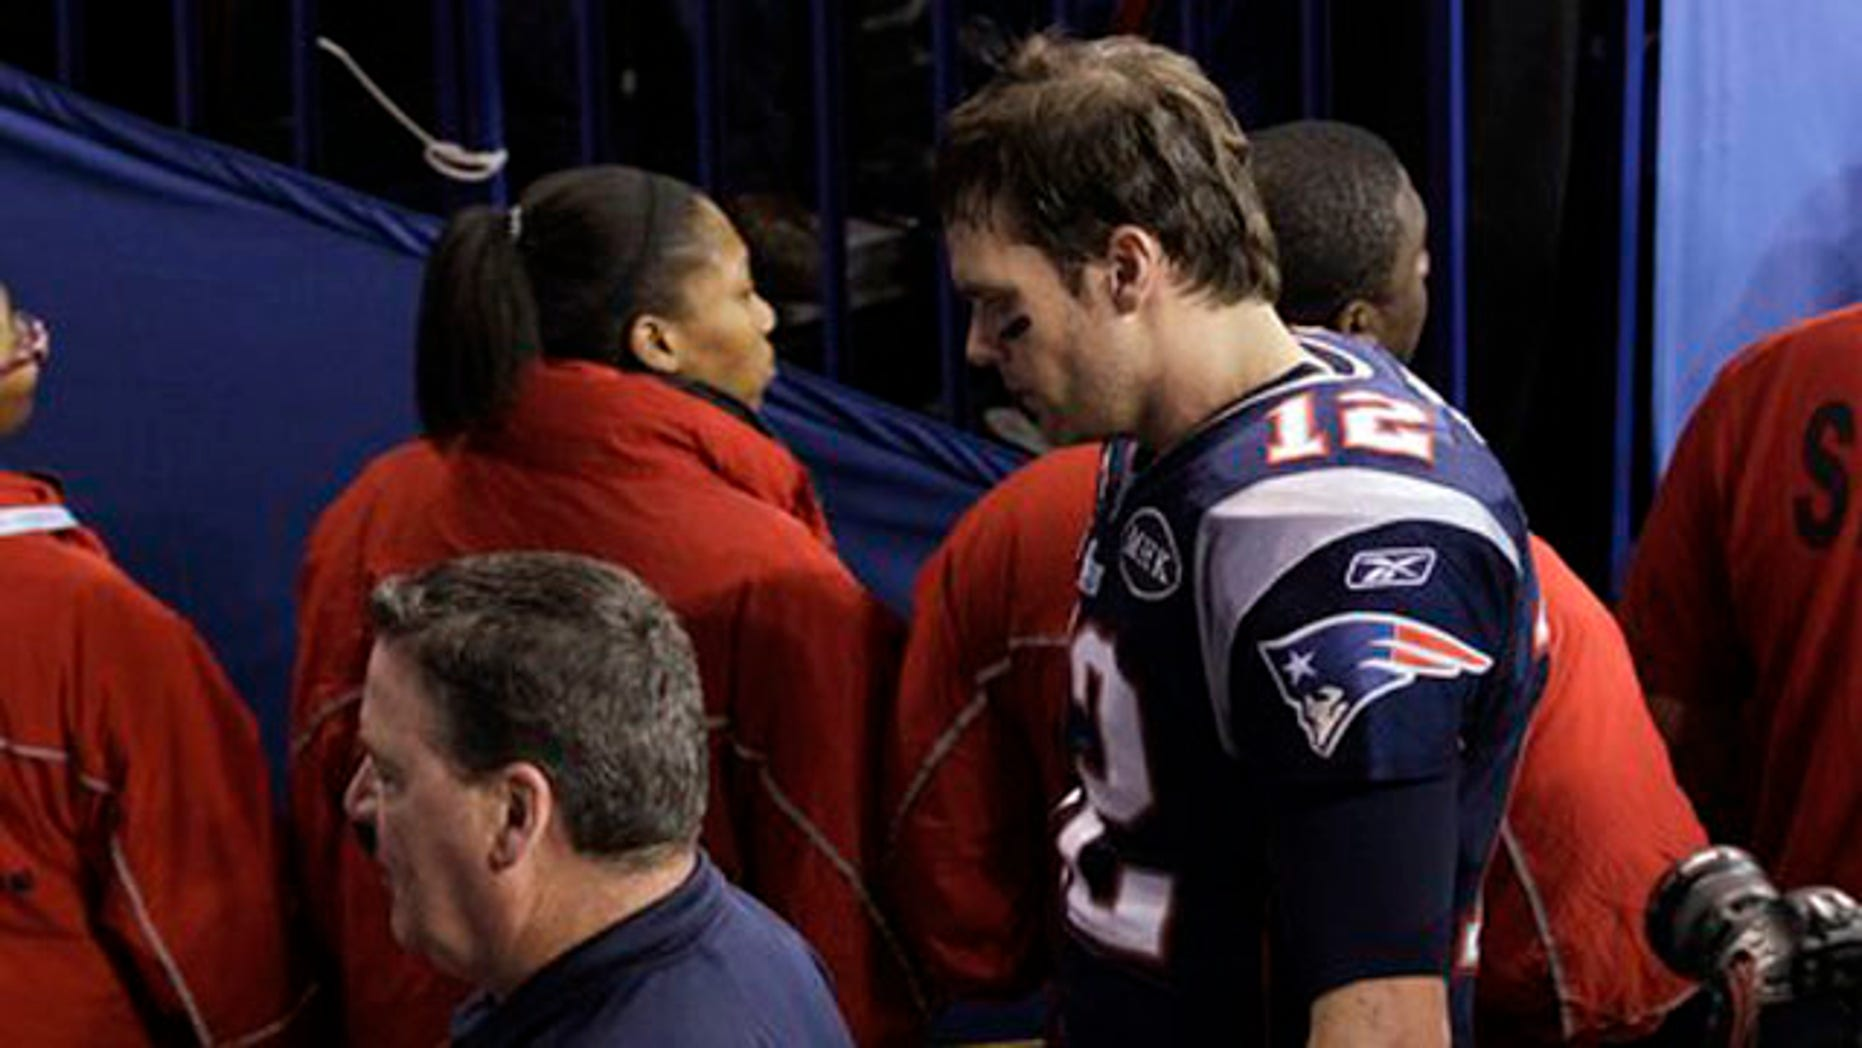 Feb. 5, 2012: New England Patriots quarterback Tom Brady leaves the field after Super Bowl loss.